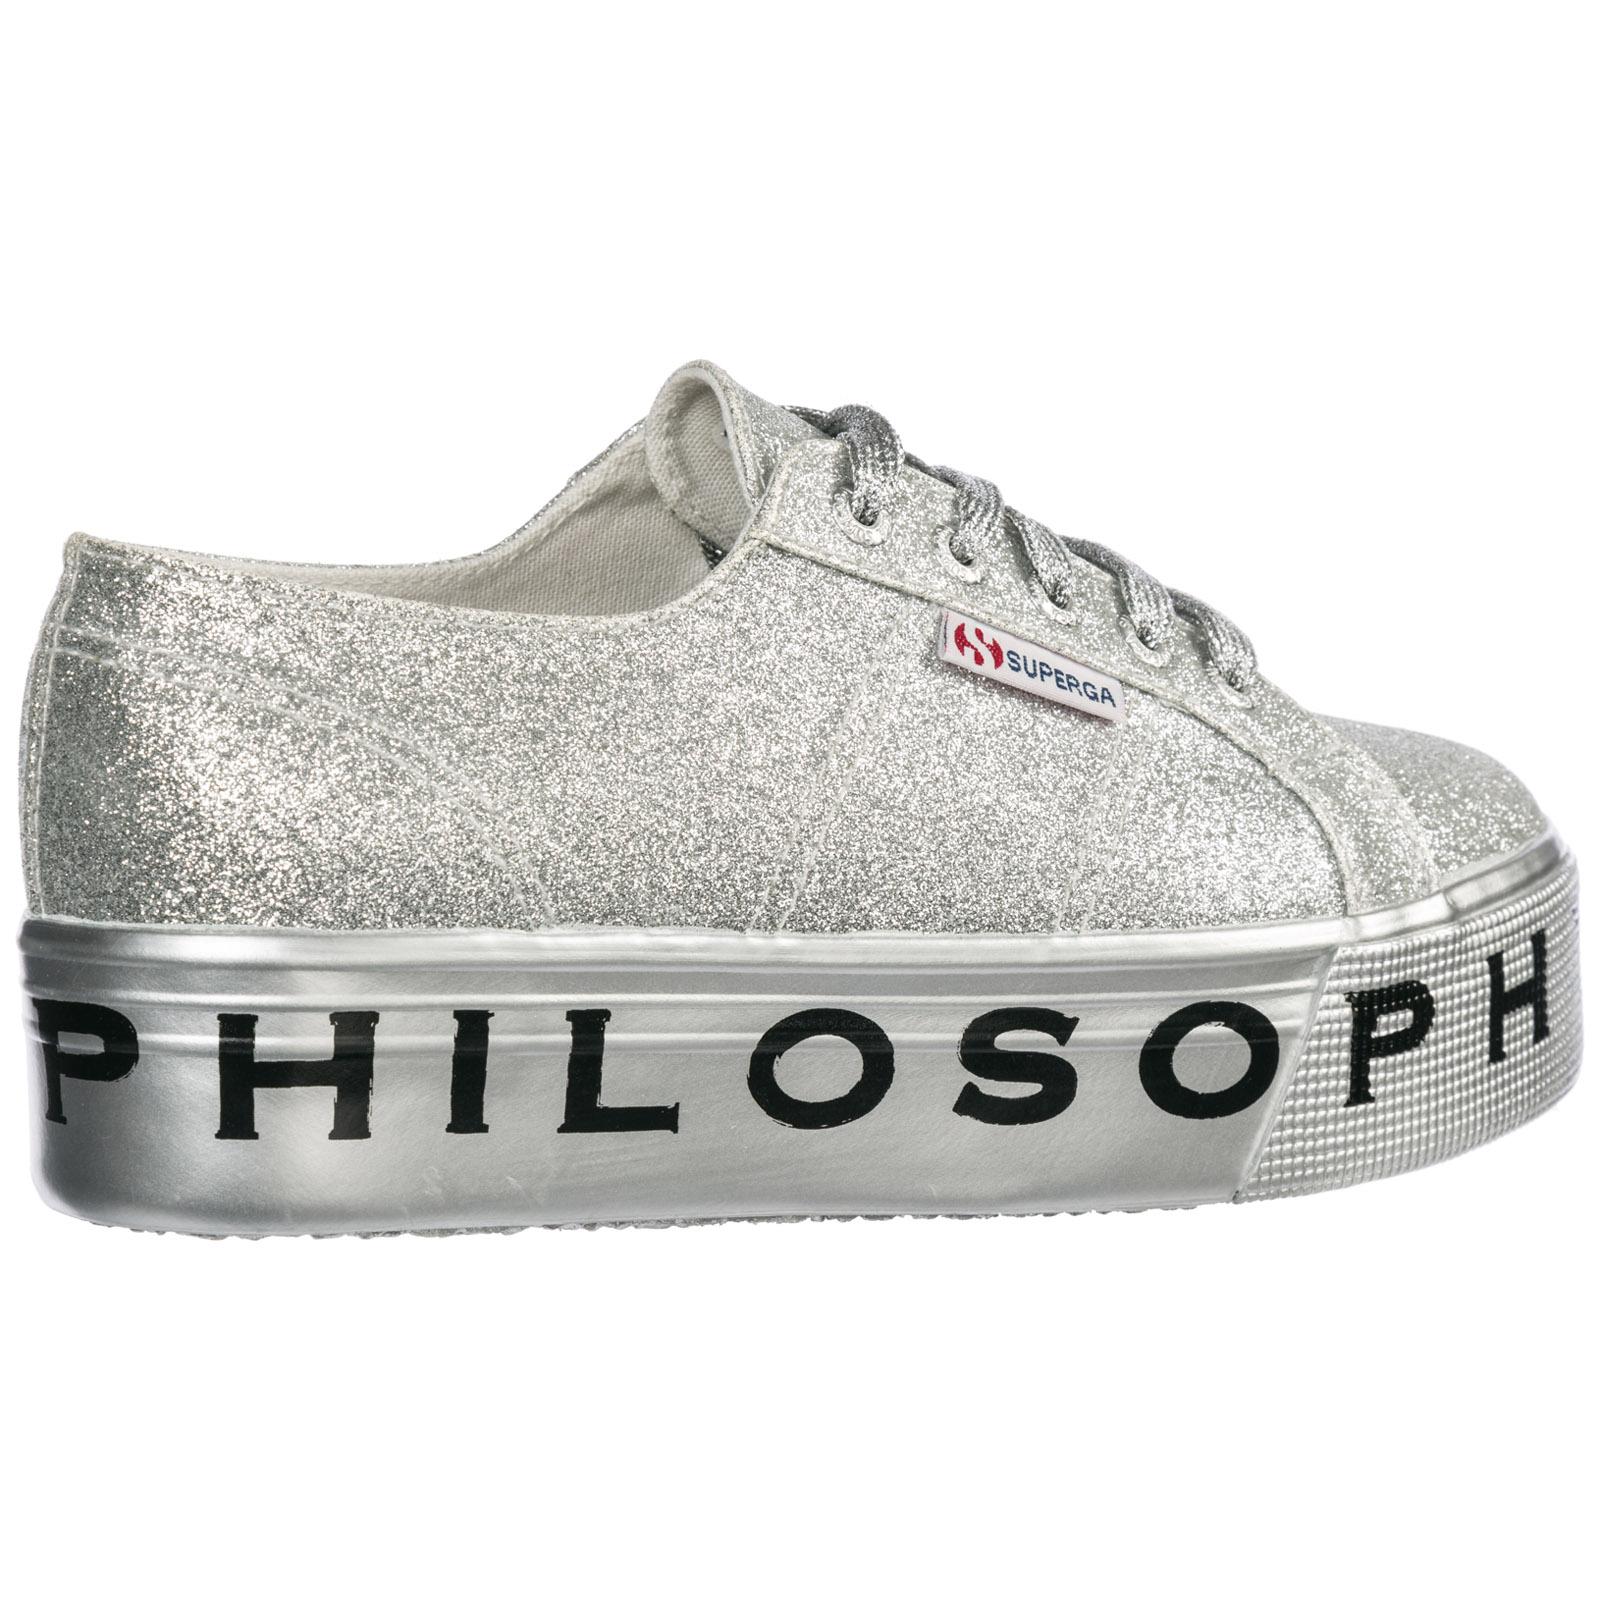 Sneakers Philosophy di Lorenzo Serafini Superga 182C J320271710600 ... 53119f6b701